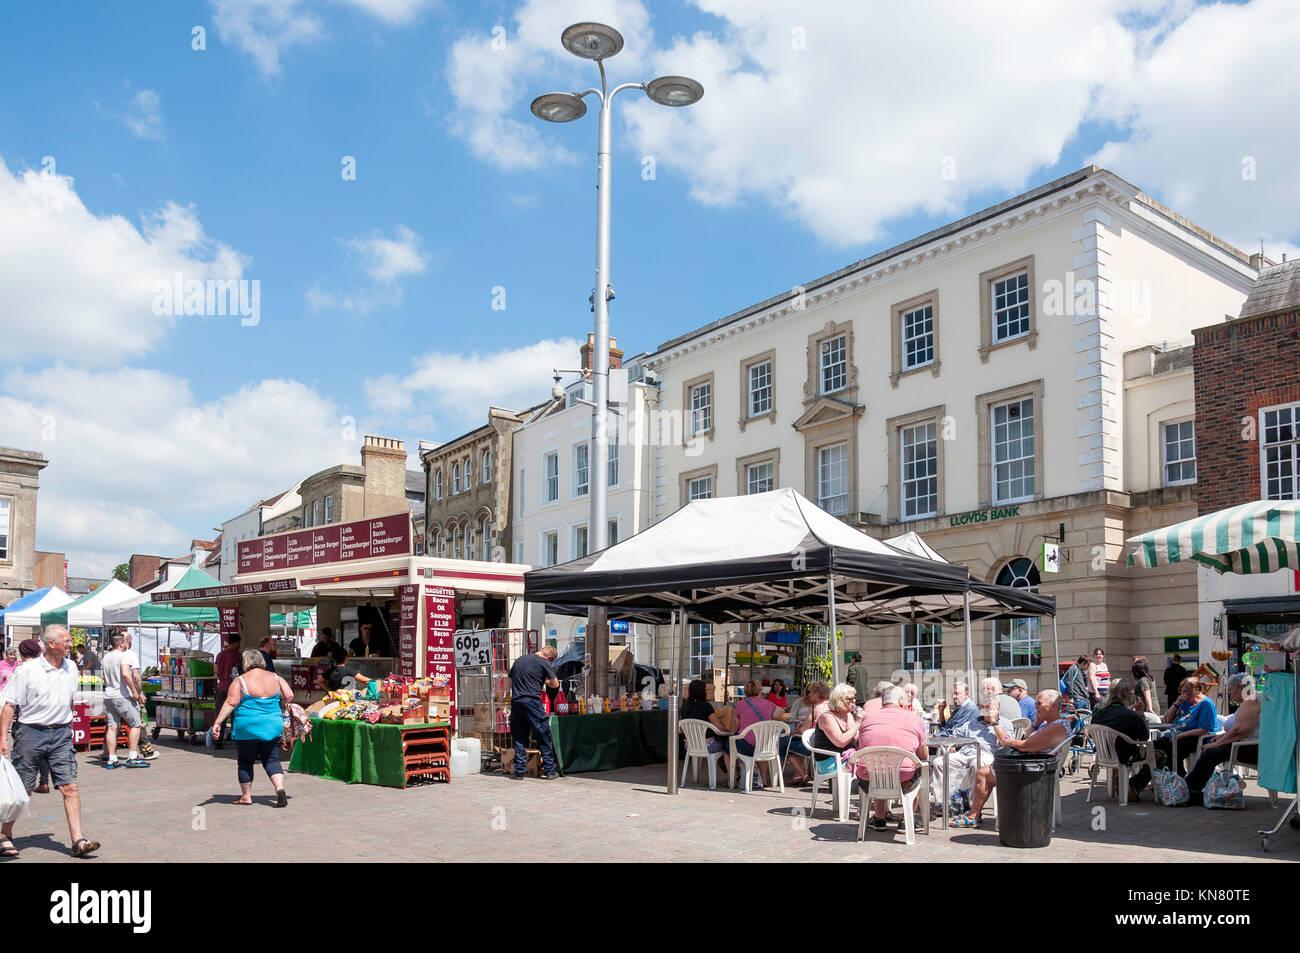 Market stalls, High Street, Andover, Hampshire, England, United Kingdom - Stock Image